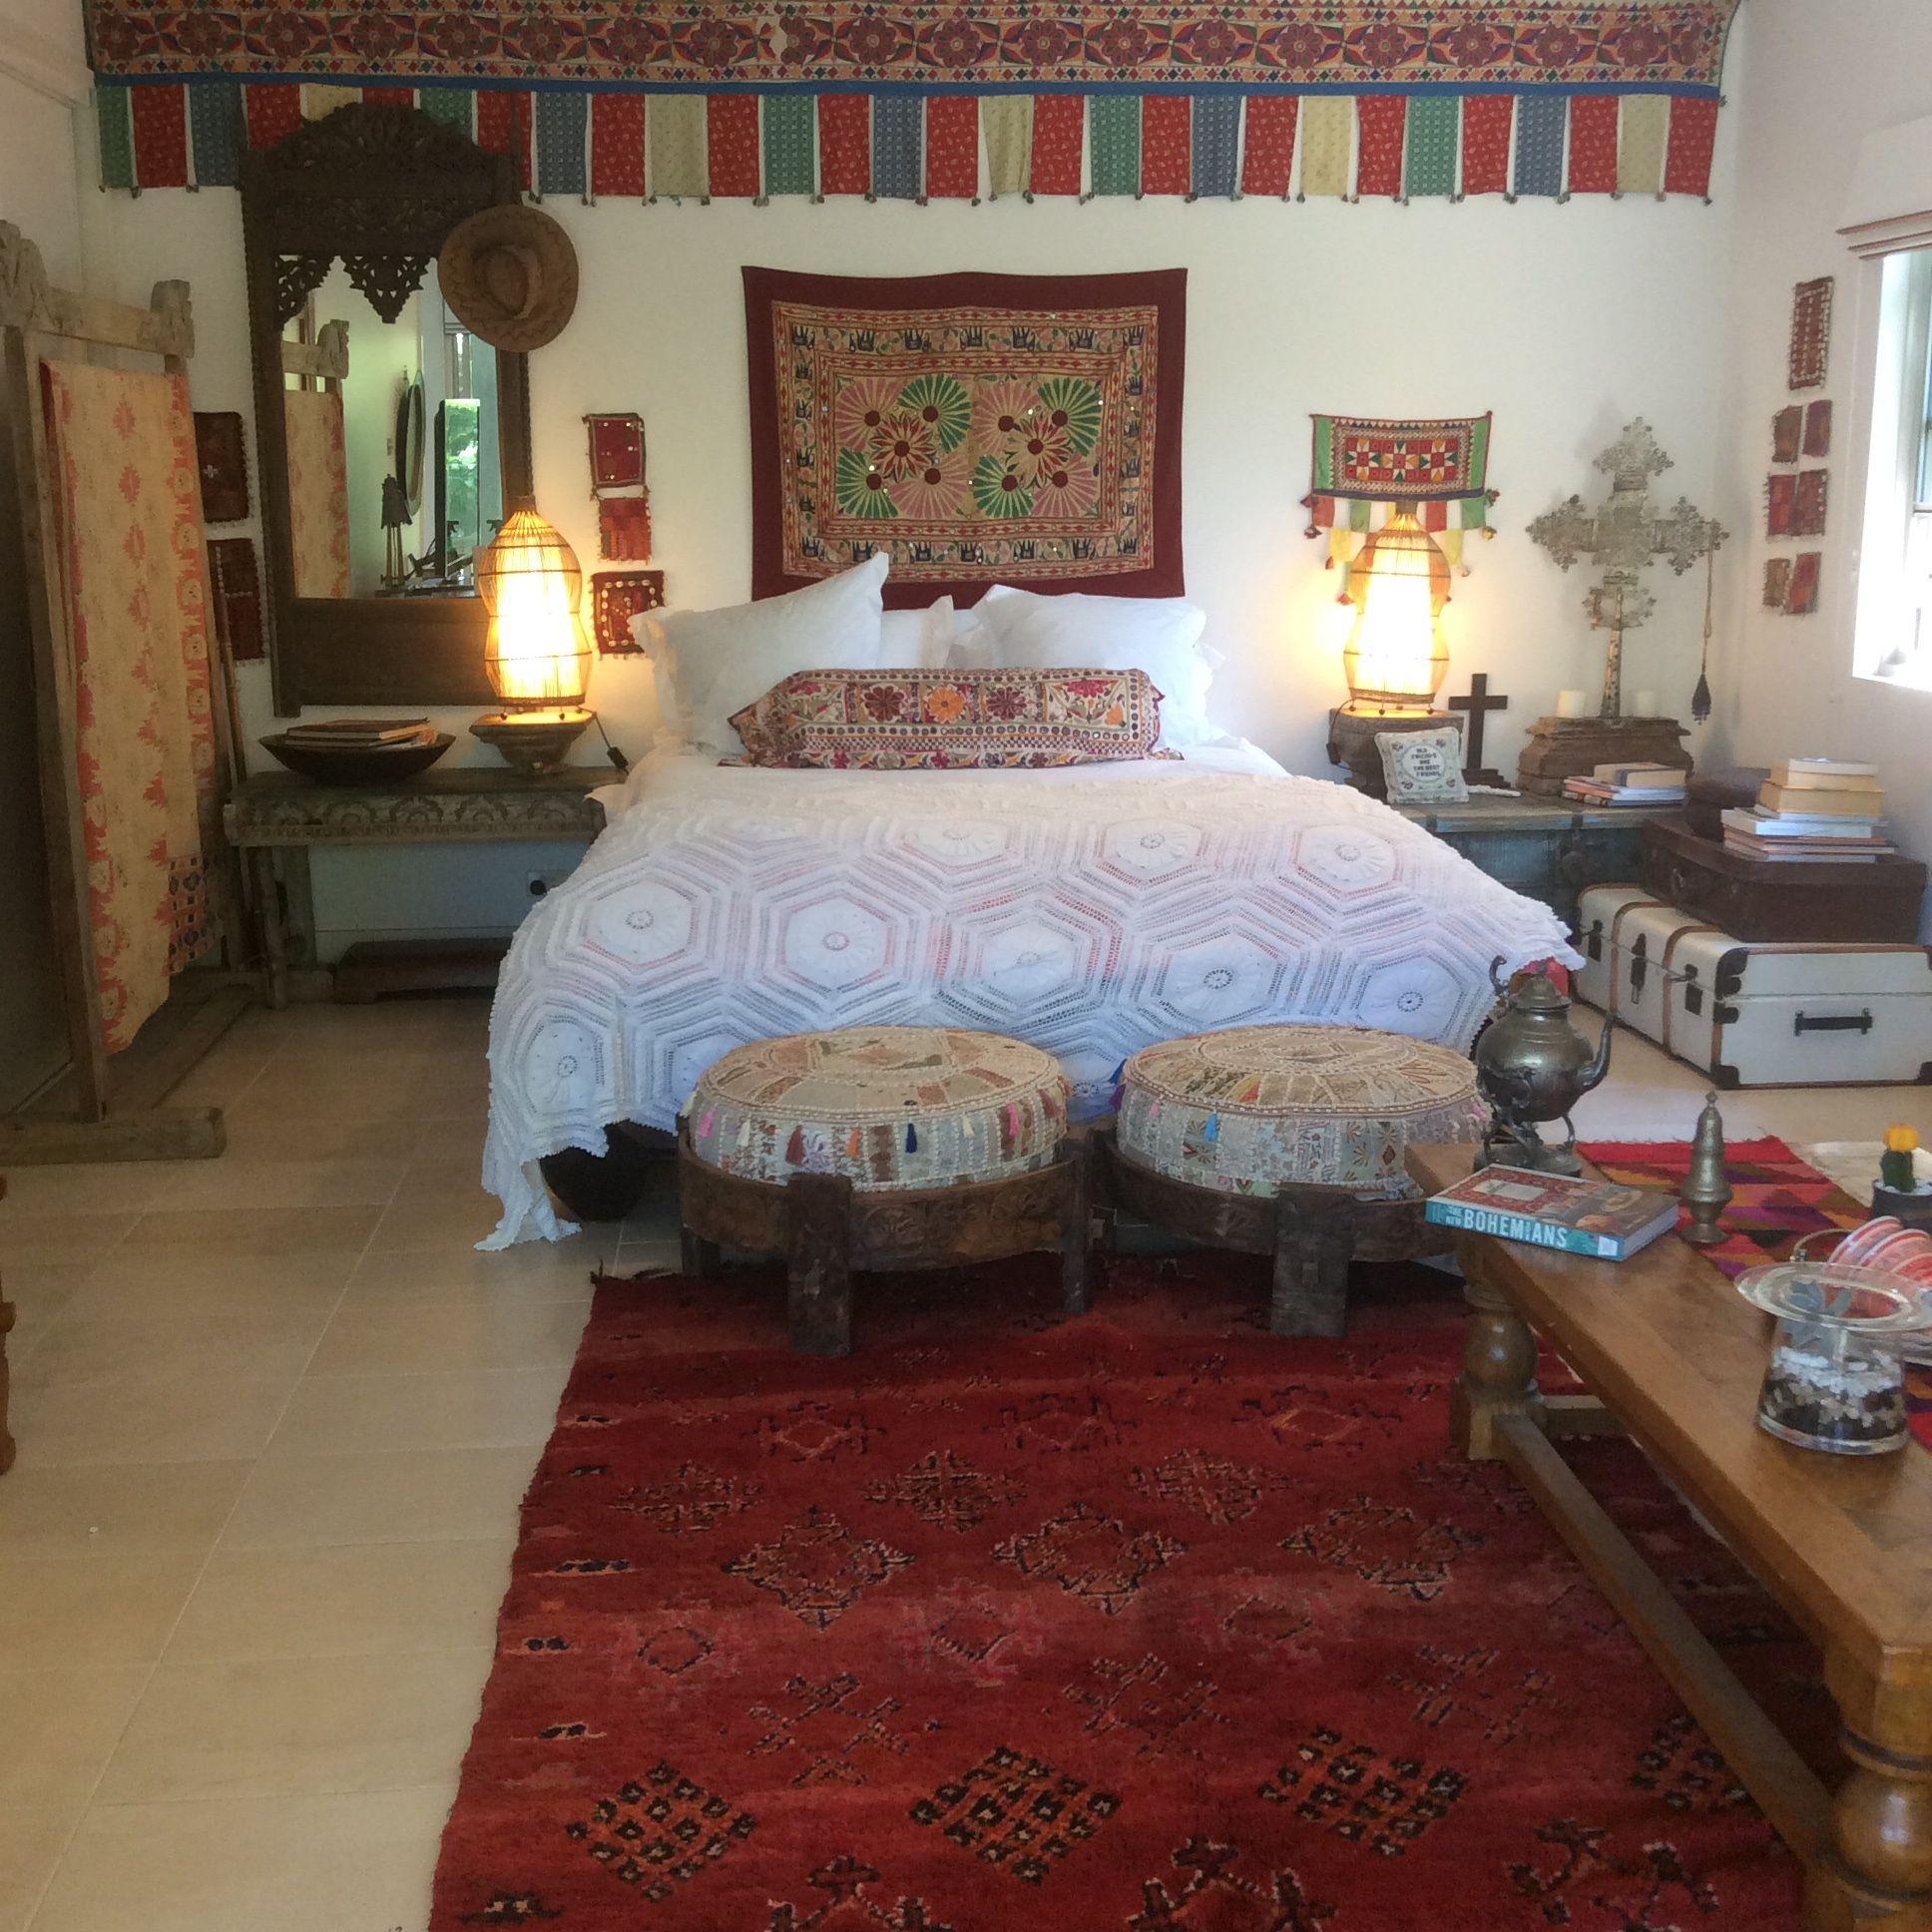 Bohemian Guest Room with rug from Mar_kett, Byron Bay, textiles from www.yatree.com.au (YATREE, BYRON BAY)